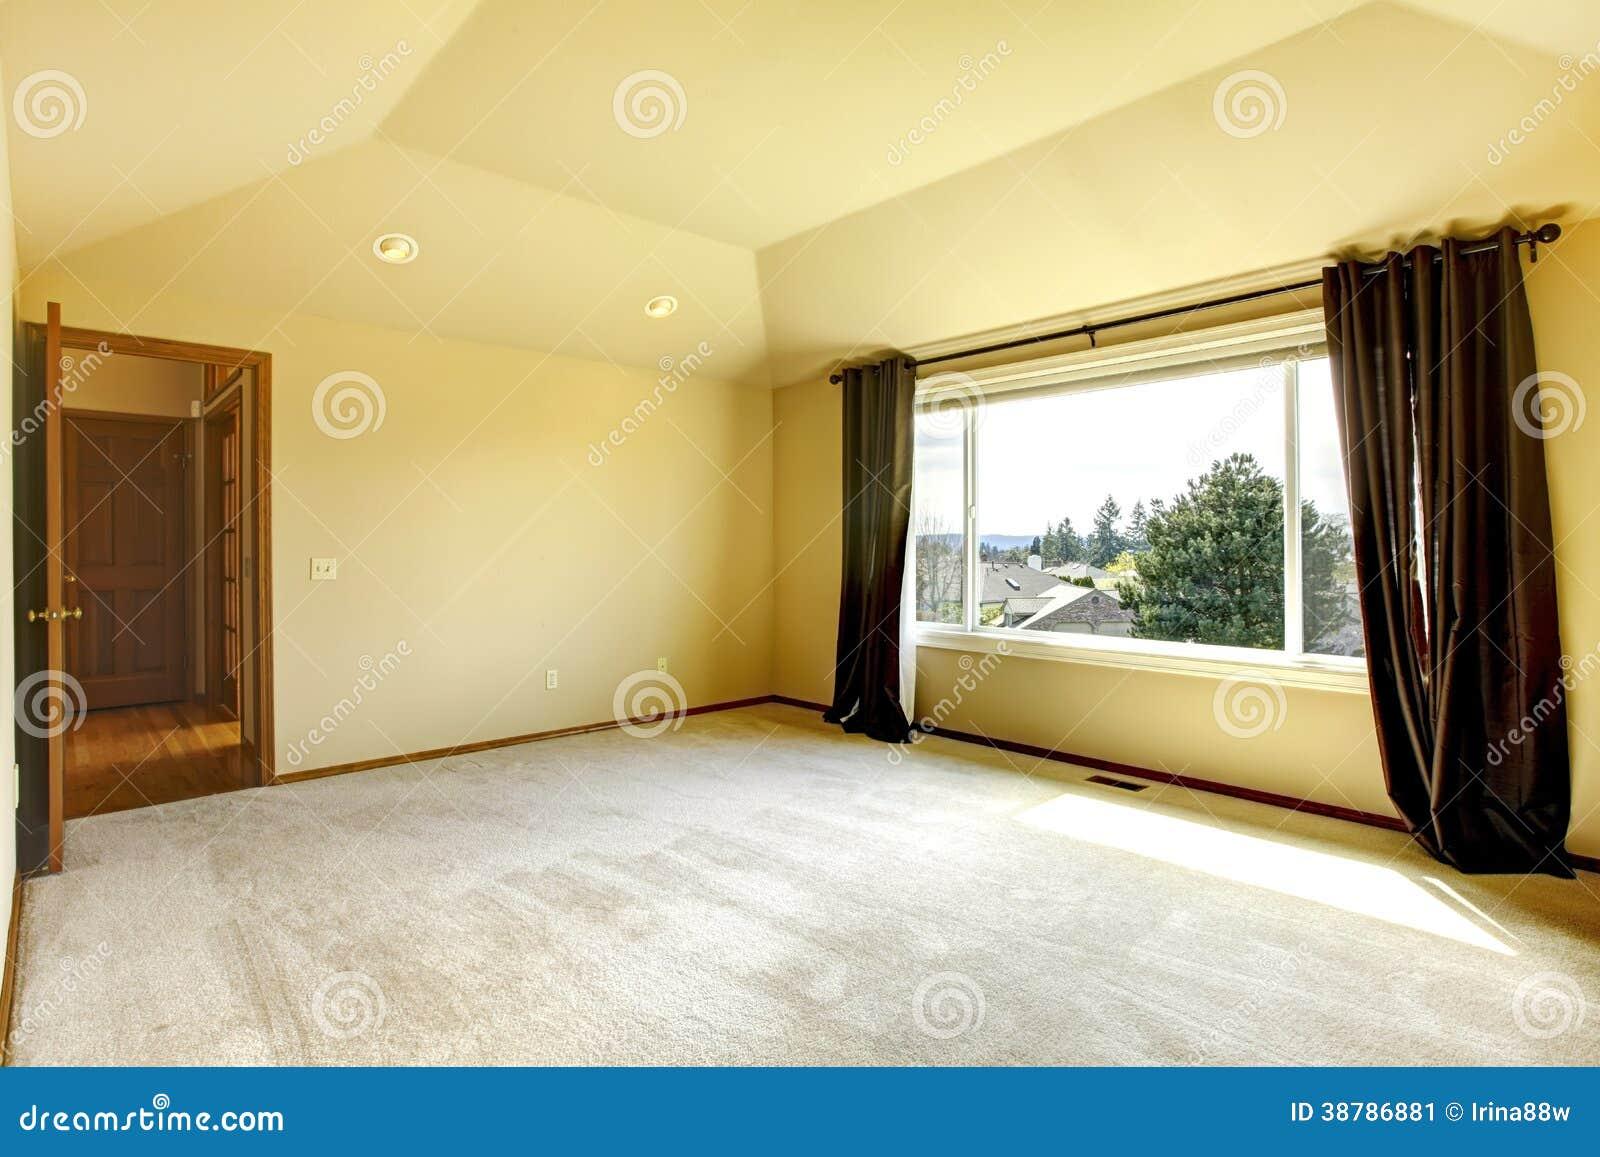 Chambre coucher vide photo stock image 38786881 for Chambre vide